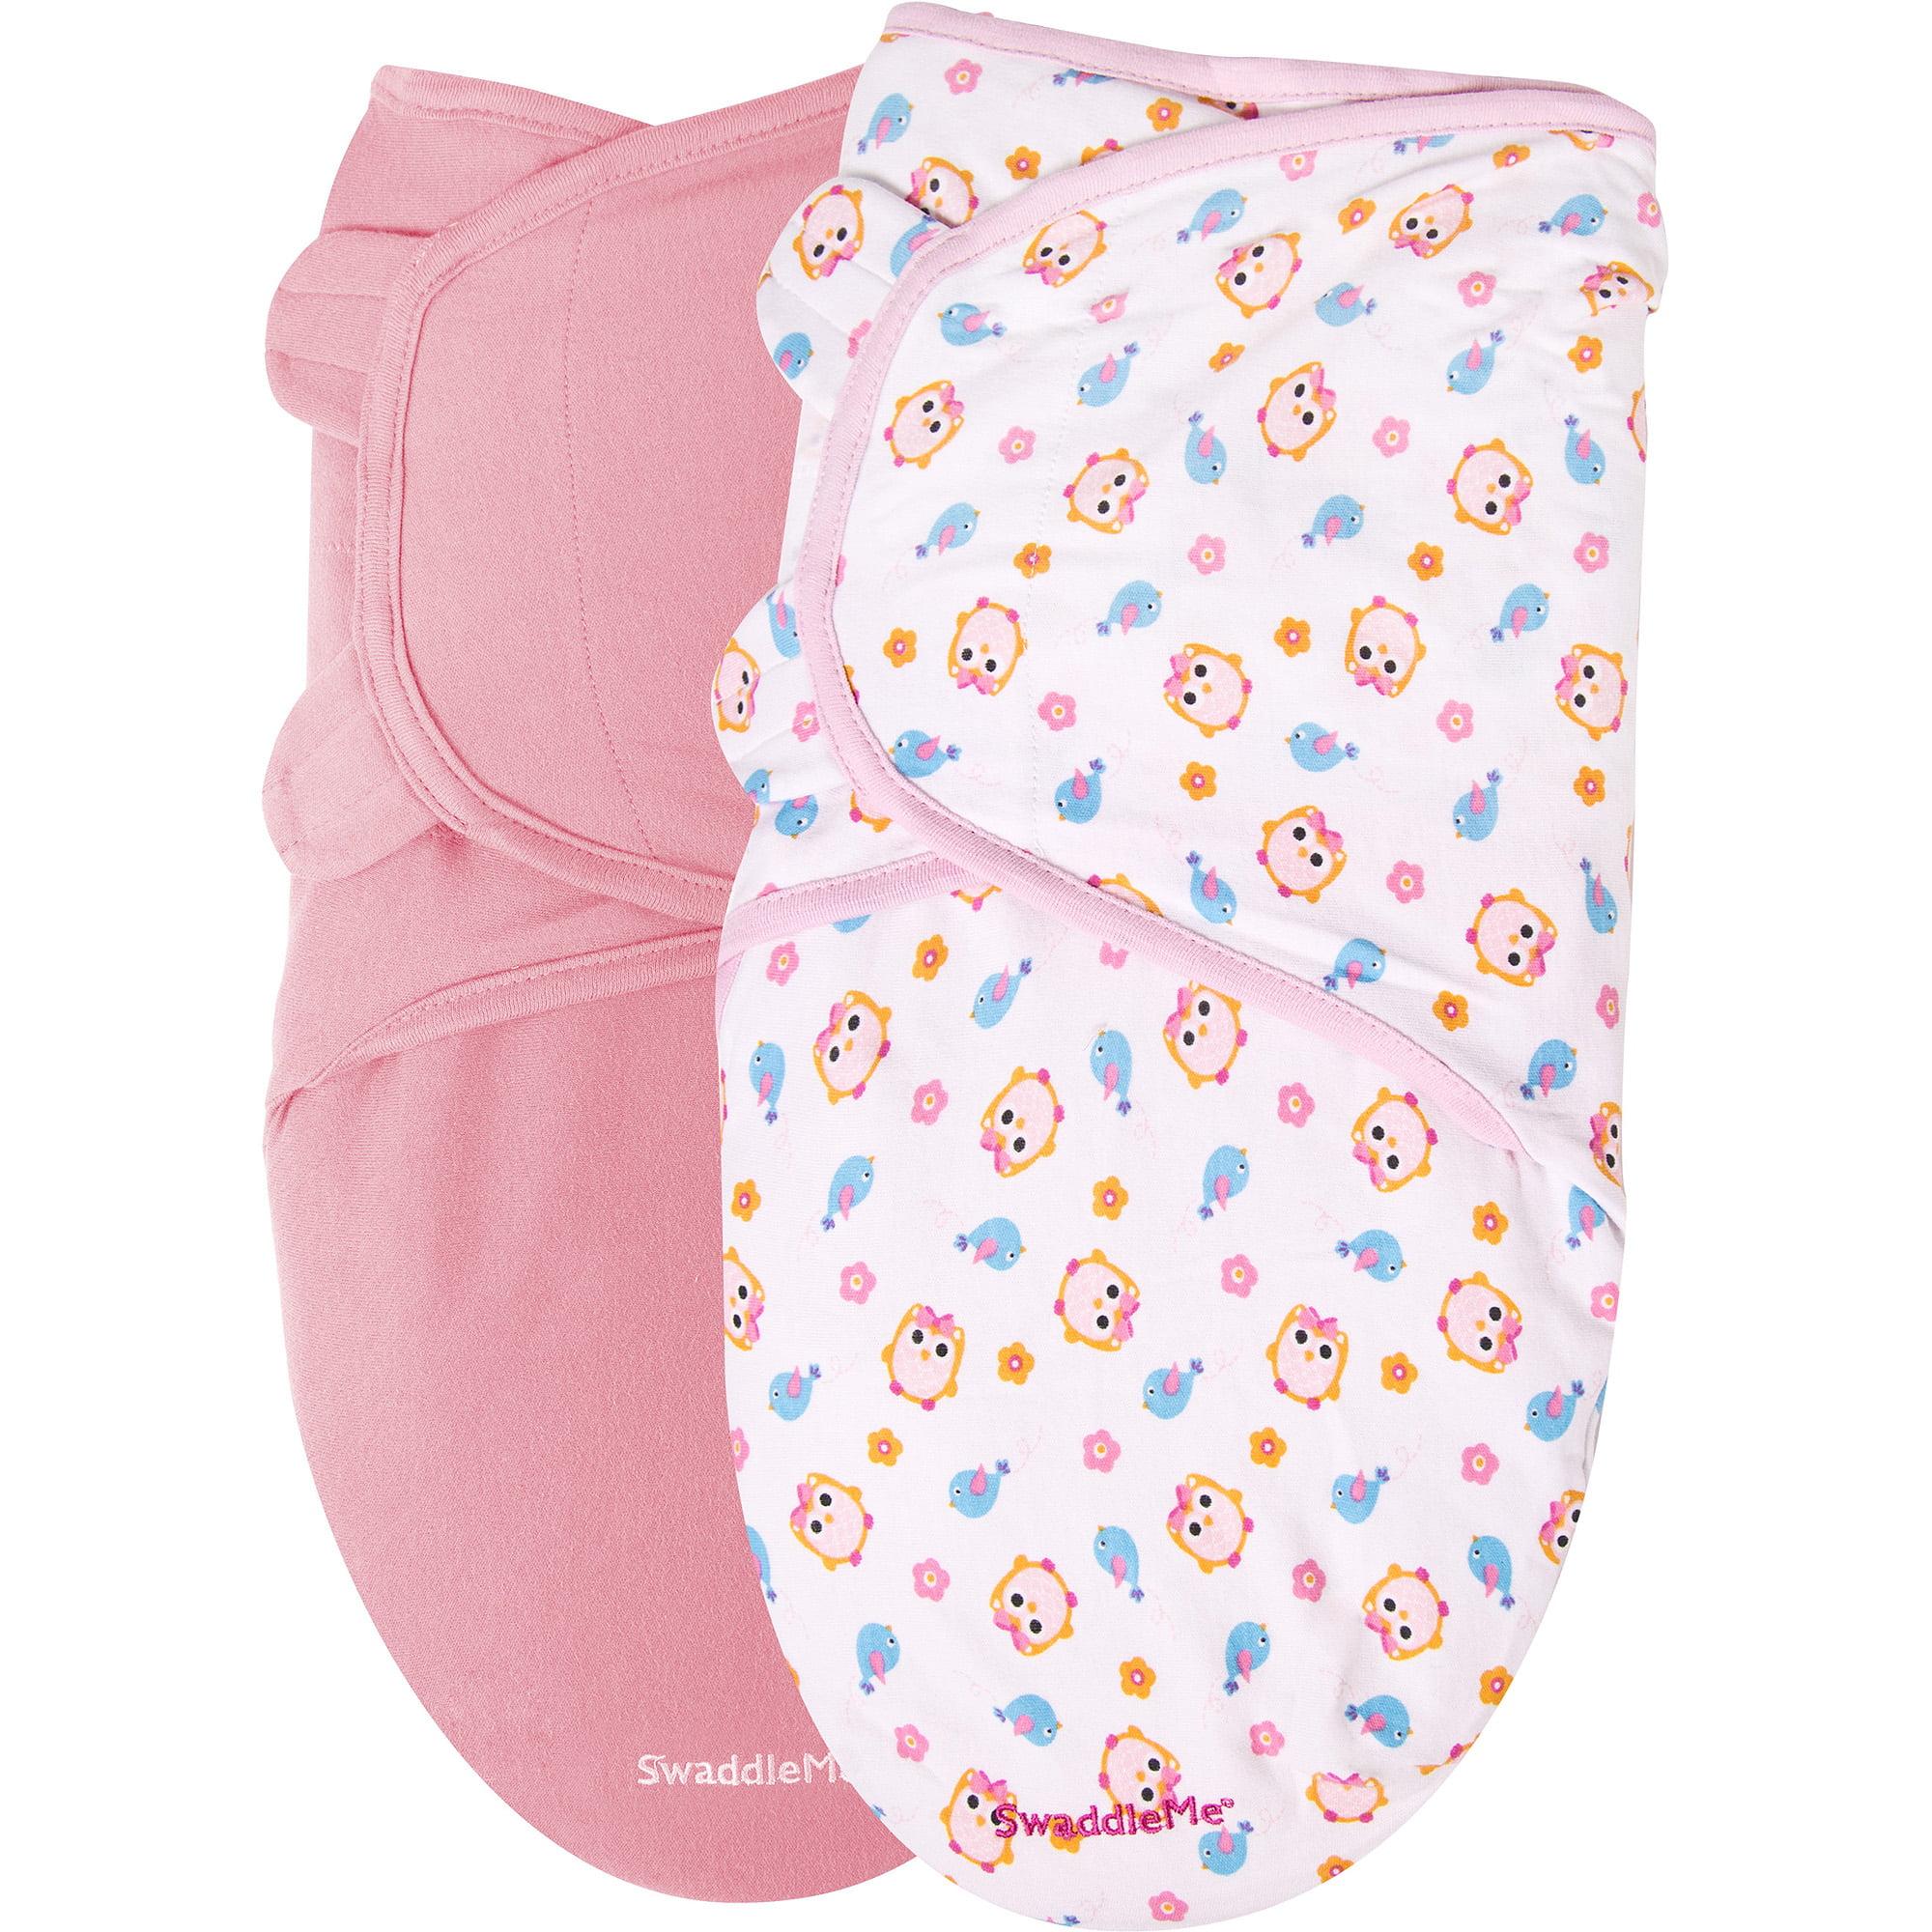 Garanimals SwaddleMe Infant Wrap, 2-Pack, Sweet Tweet, Size 0-6 Months